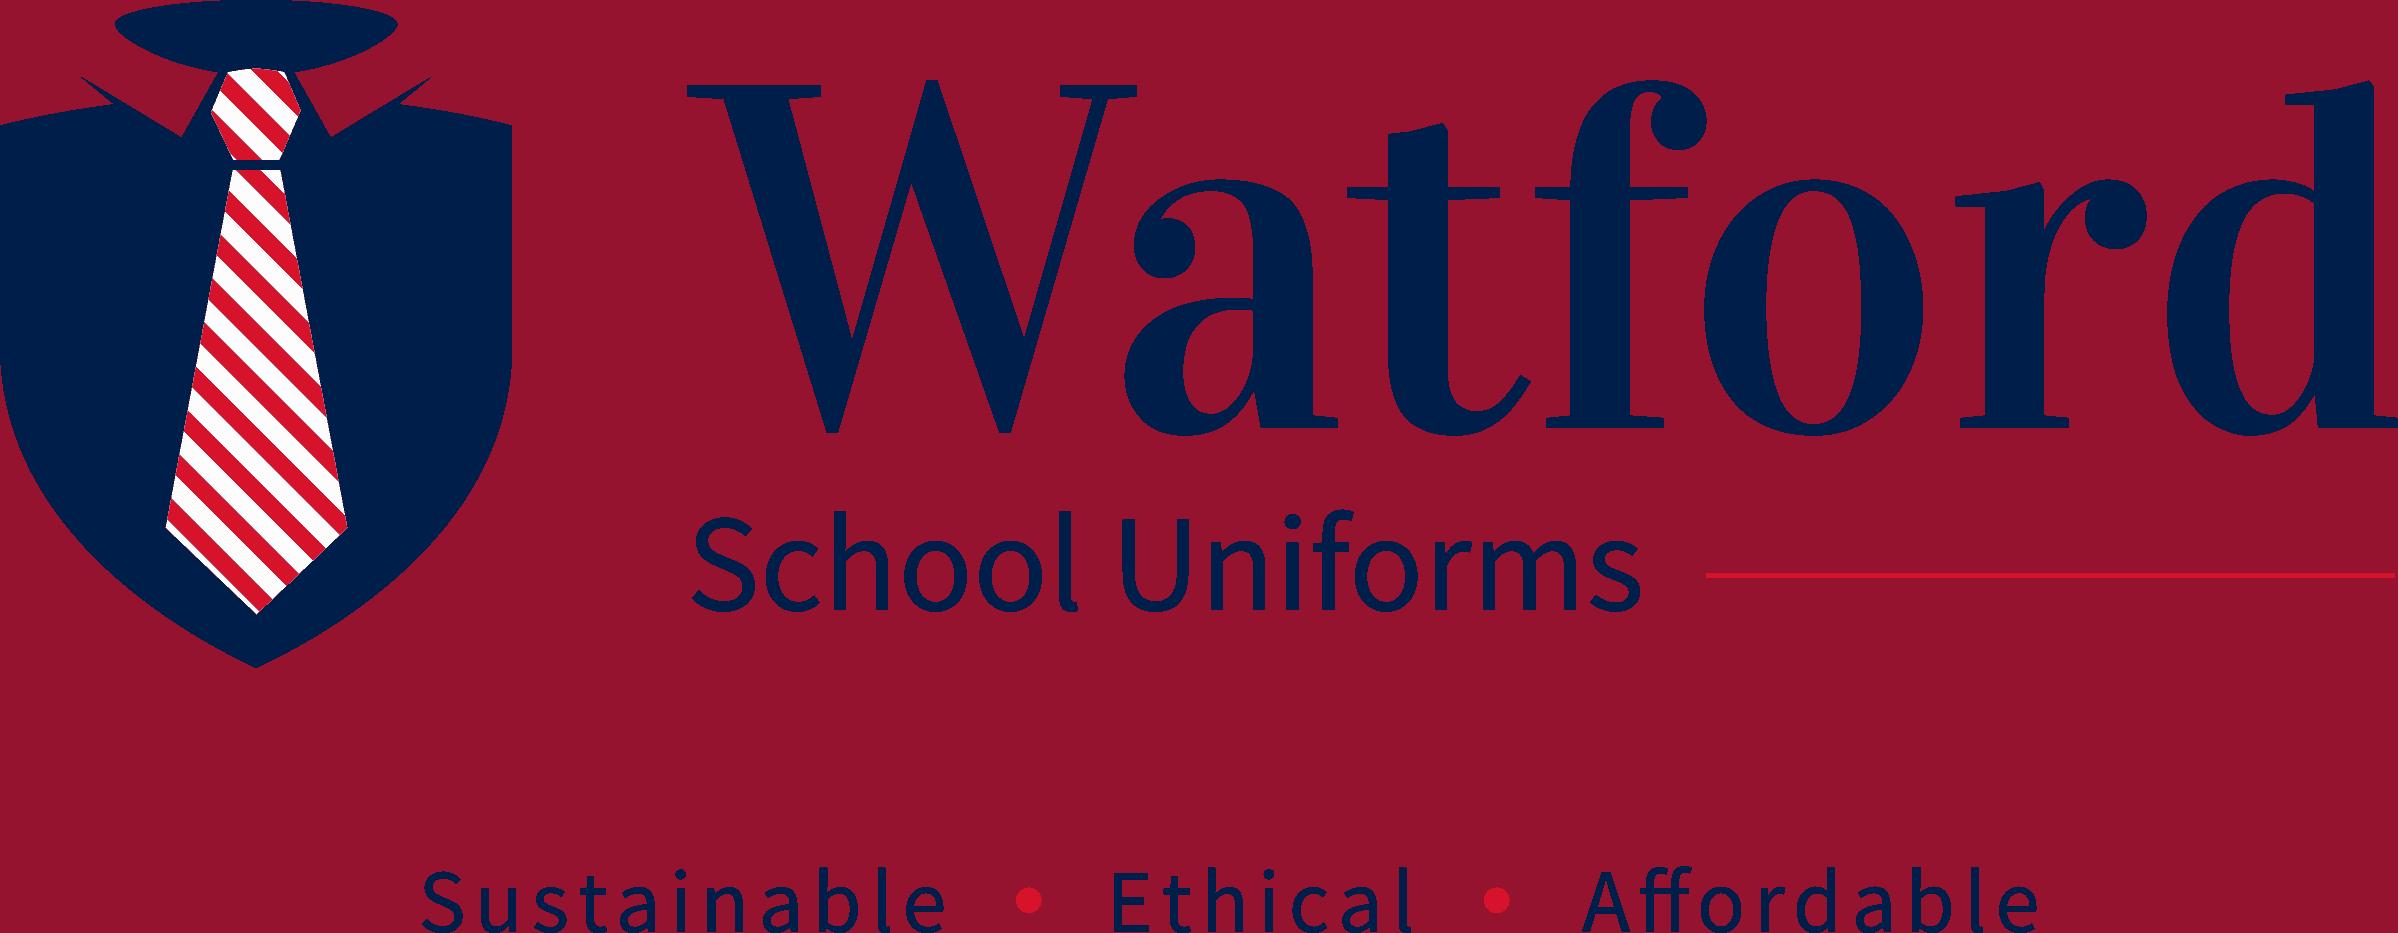 Watford School Uniforms